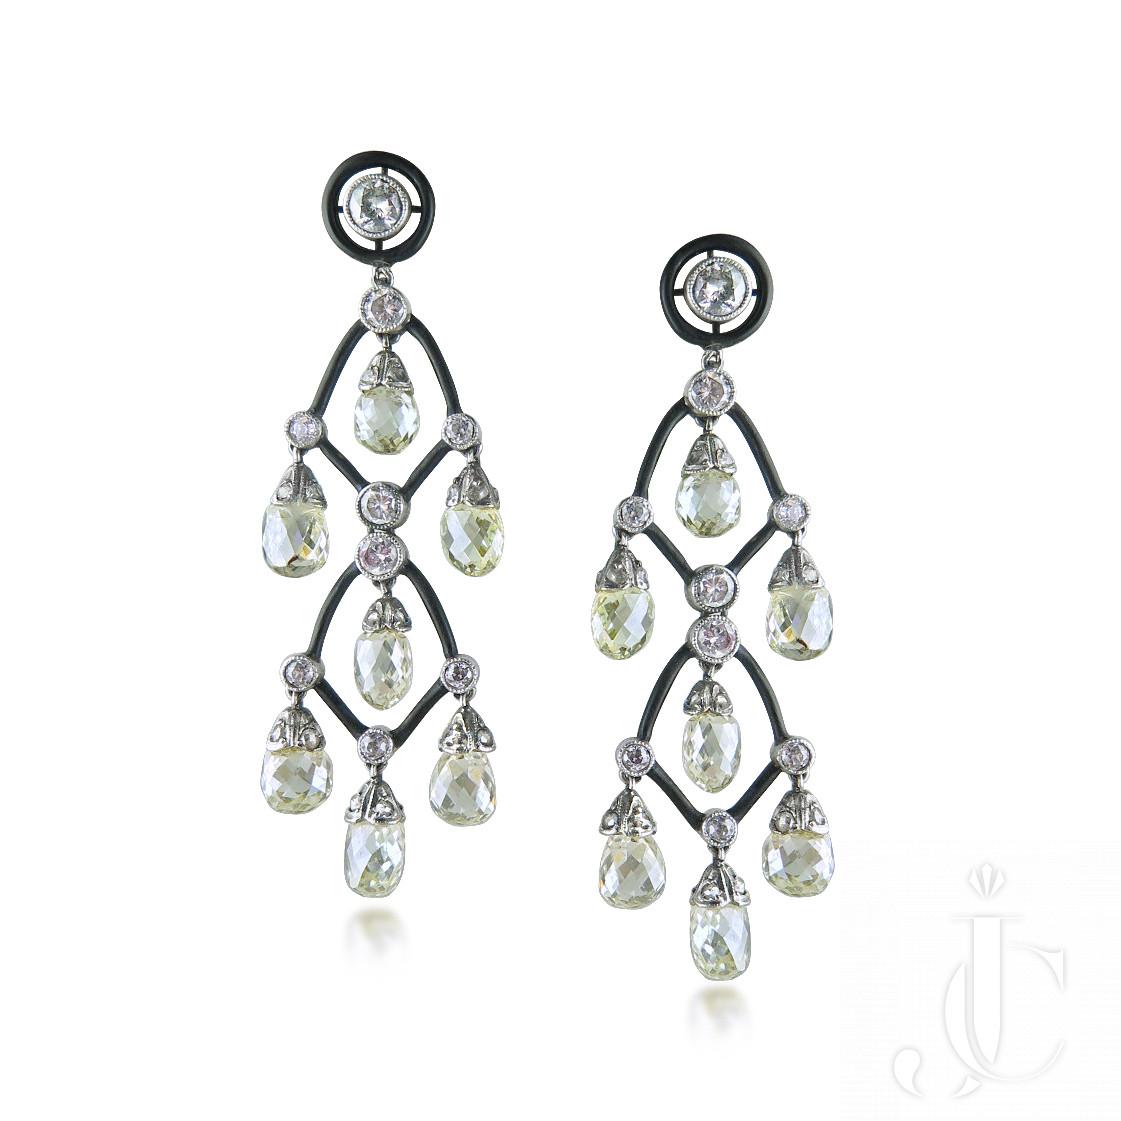 Pair of diamond and enamel cascade ear-pendants